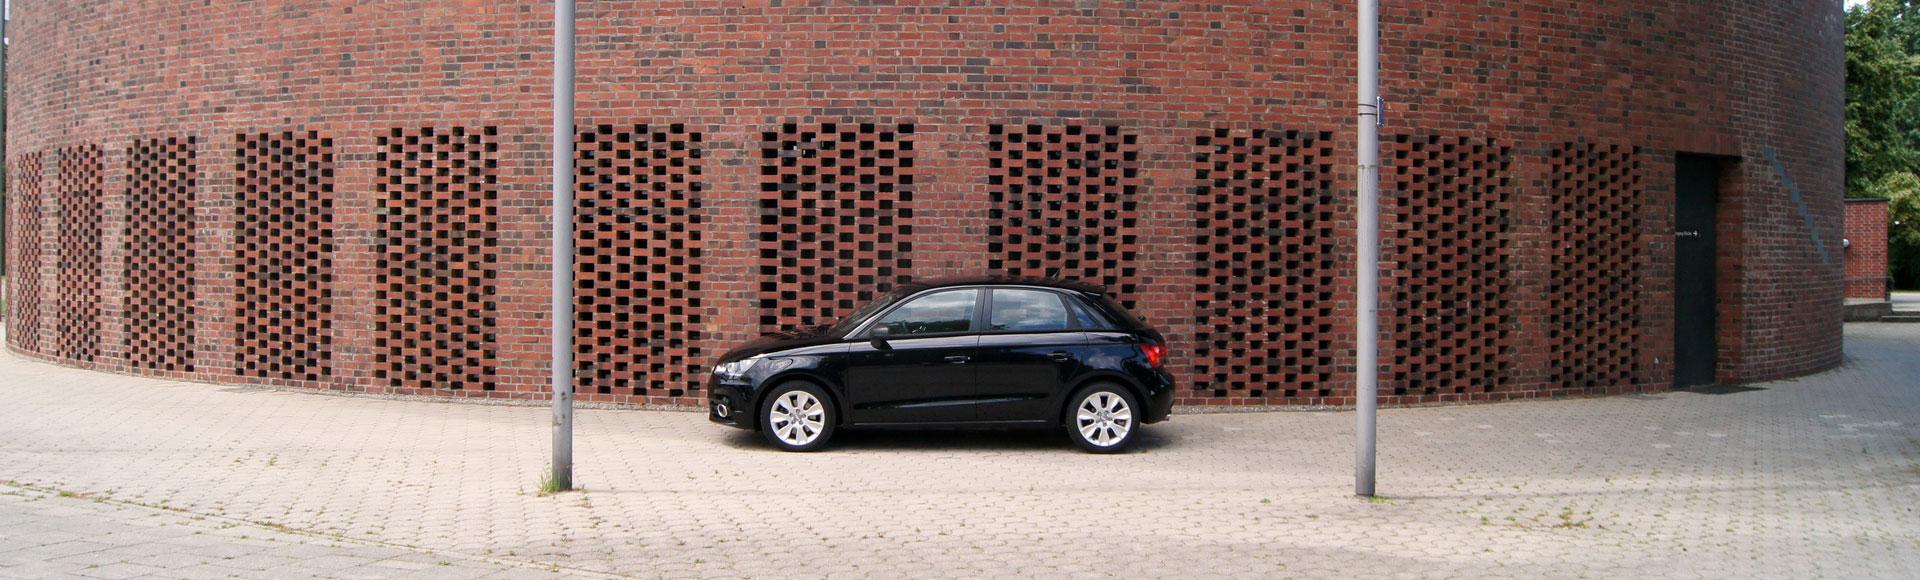 Audi A1 2013 7927